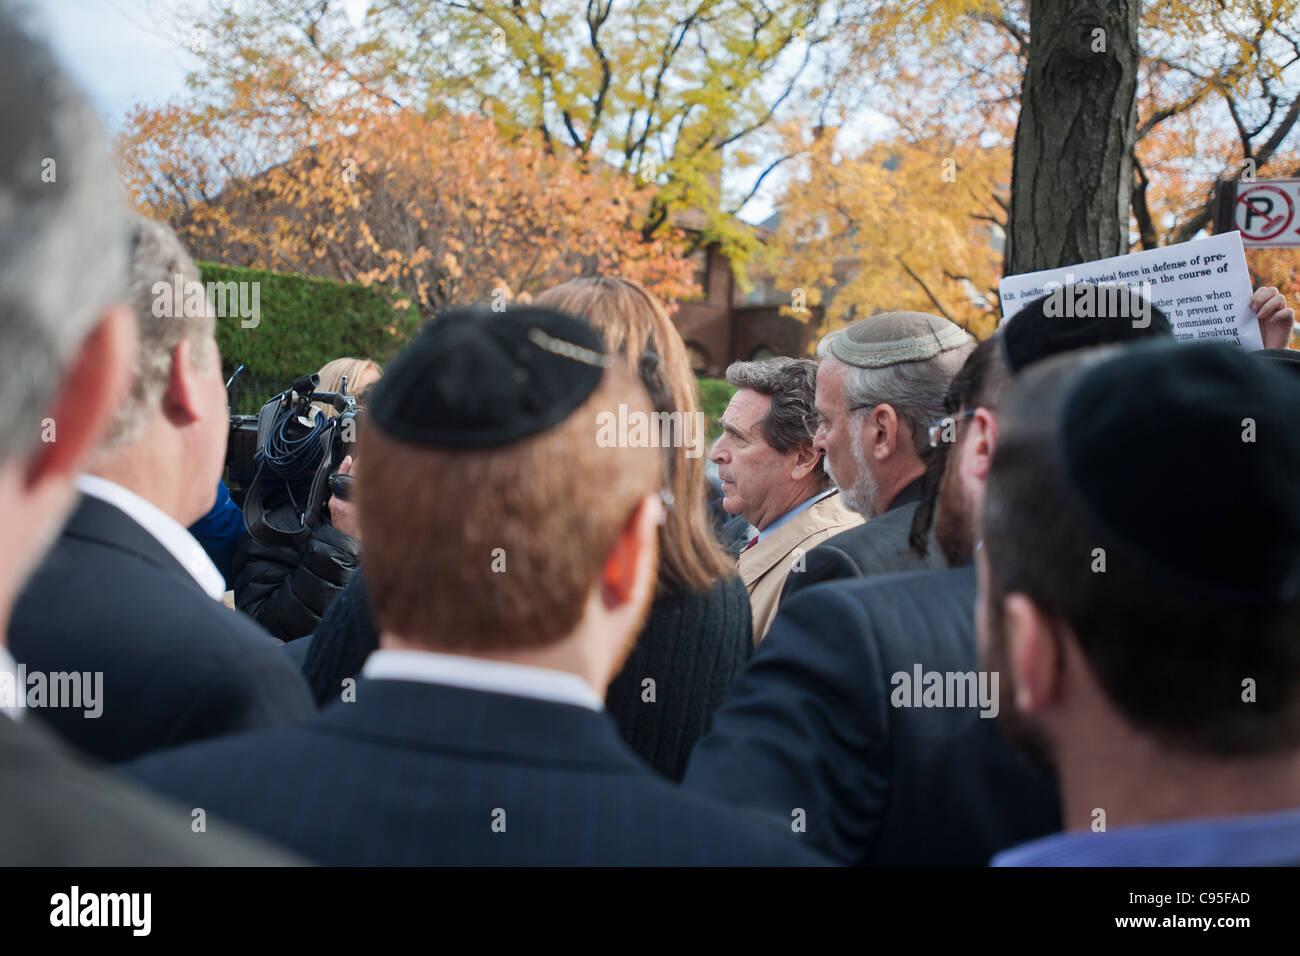 March down Ocean Parkway in the Midwood neighborhood of Brooklyn in New York against anti-semitism - Stock Image